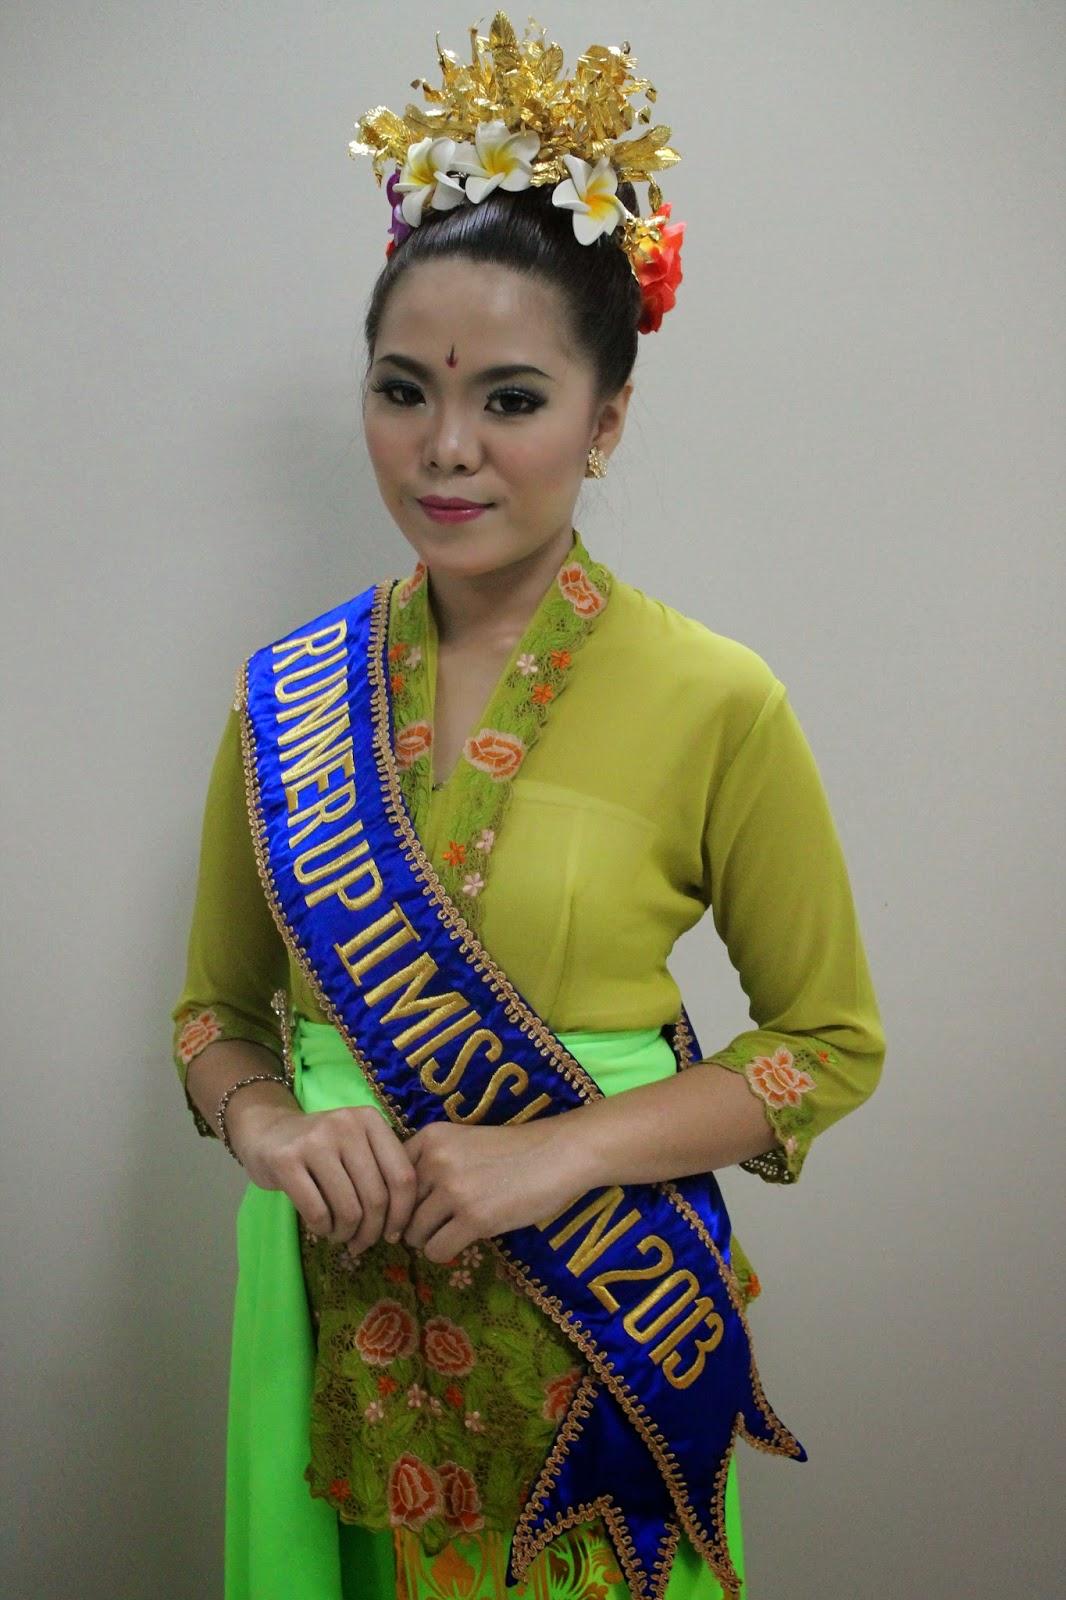 """ SANGGAR NUSANTARA DOT COM "" | Jakarta: SEWA BAJU BALI"